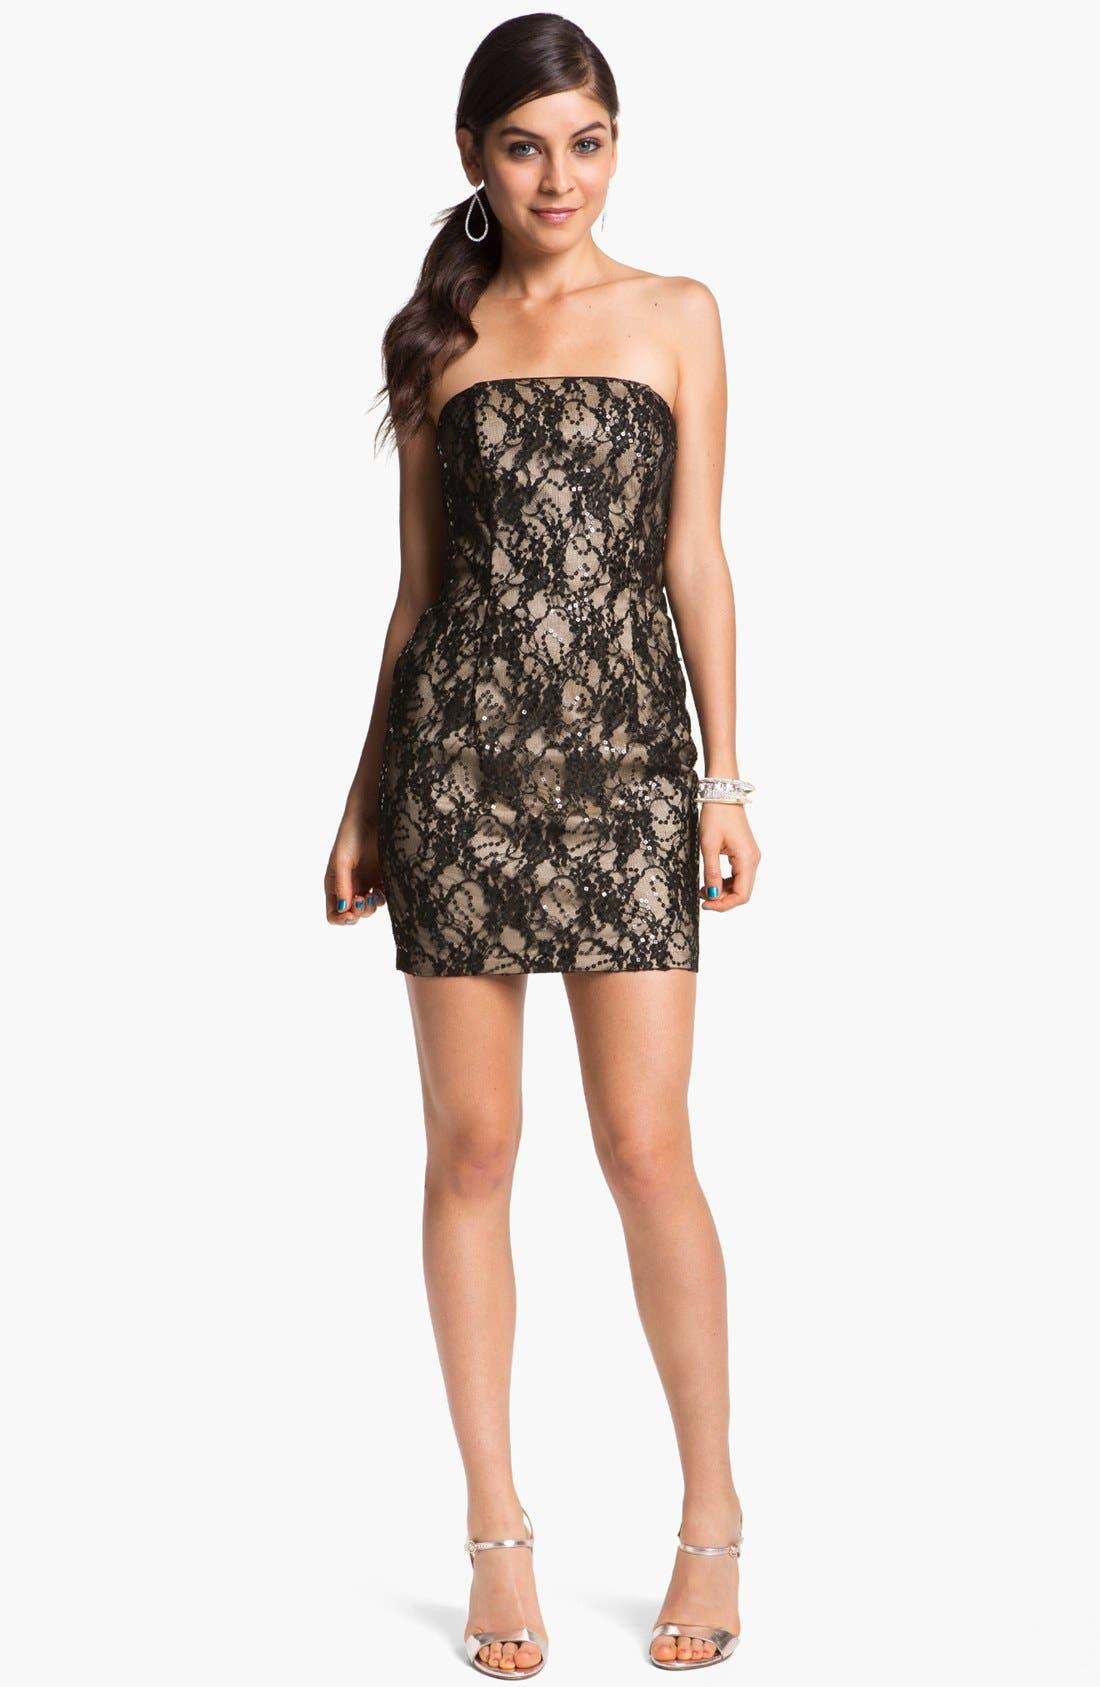 Alternate Image 1 Selected - Jessica McClintock Strapless Lace Minidress